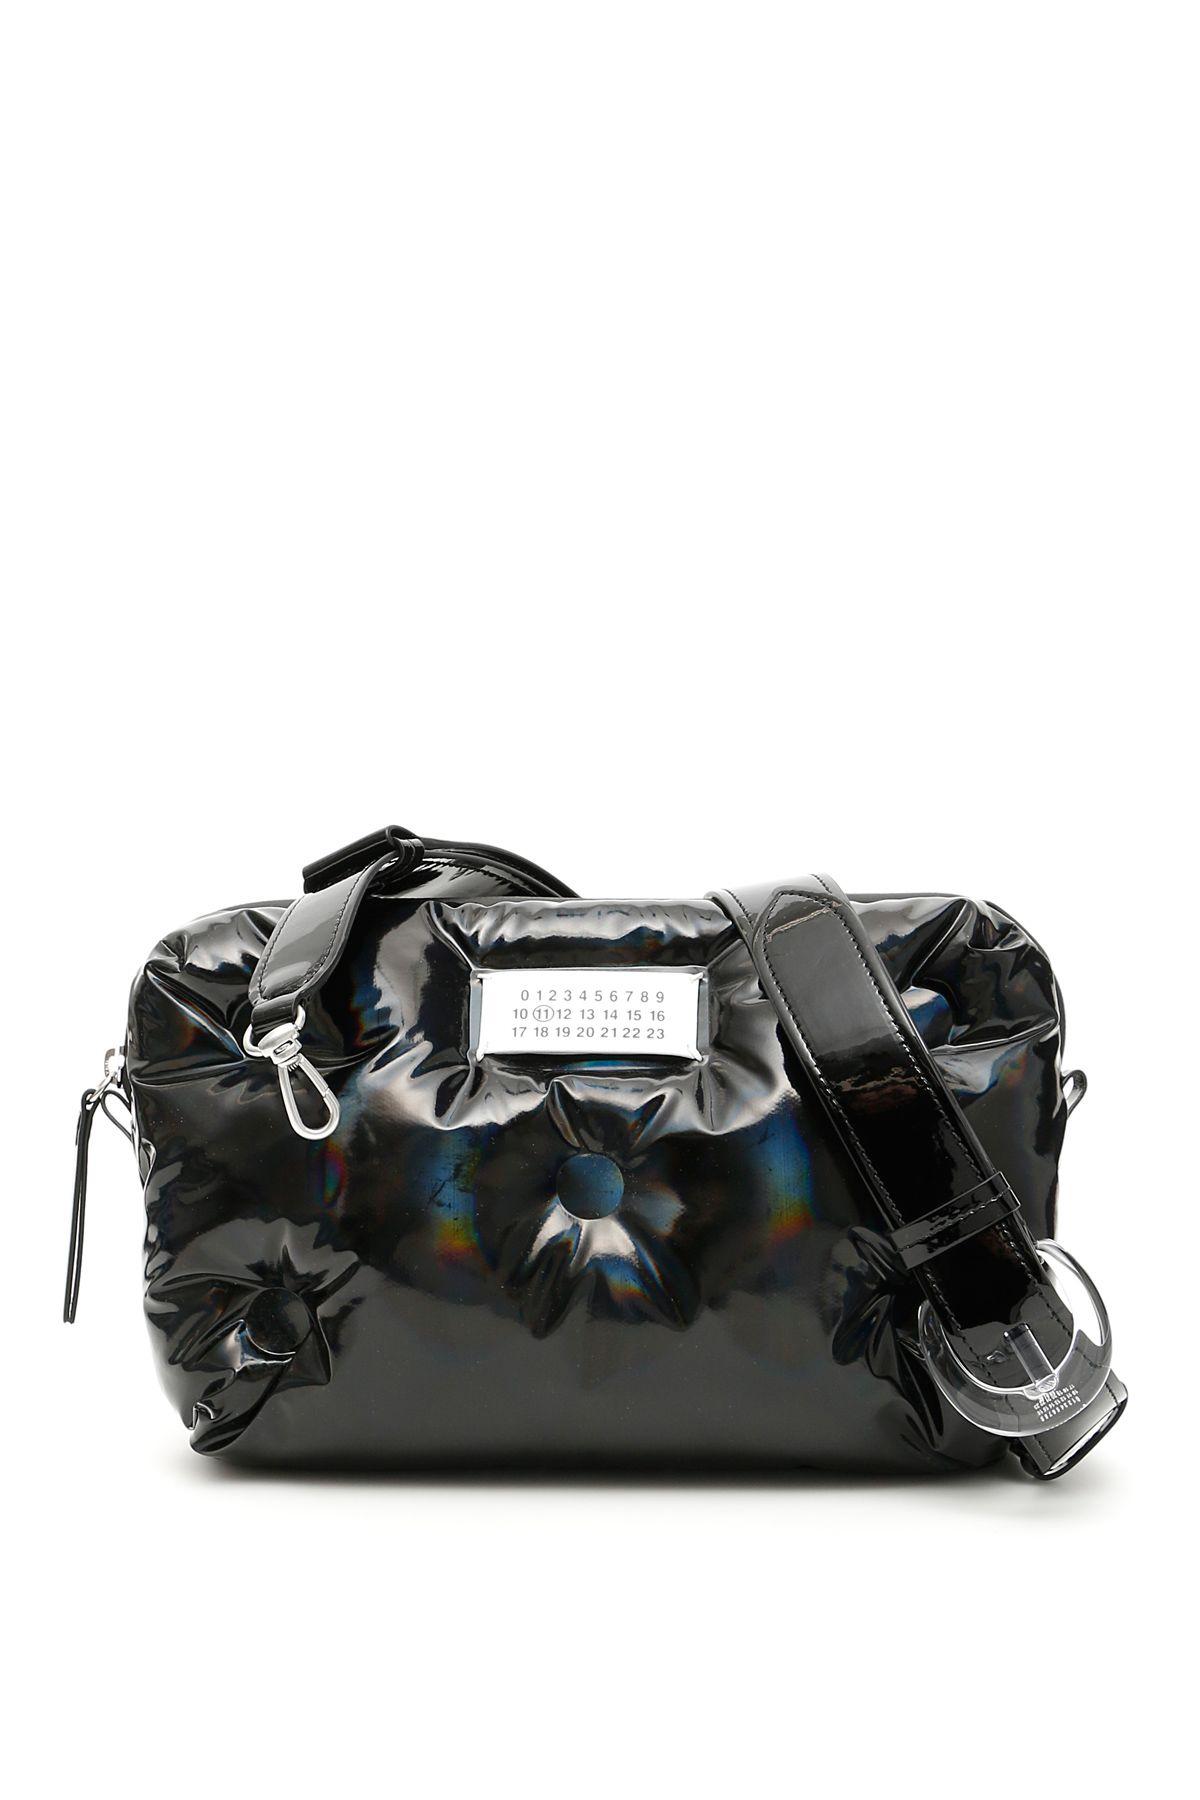 6d79e2d51eda Maison Margiela Maison Margiela Glam Slam Bag - BLACK (Black ...